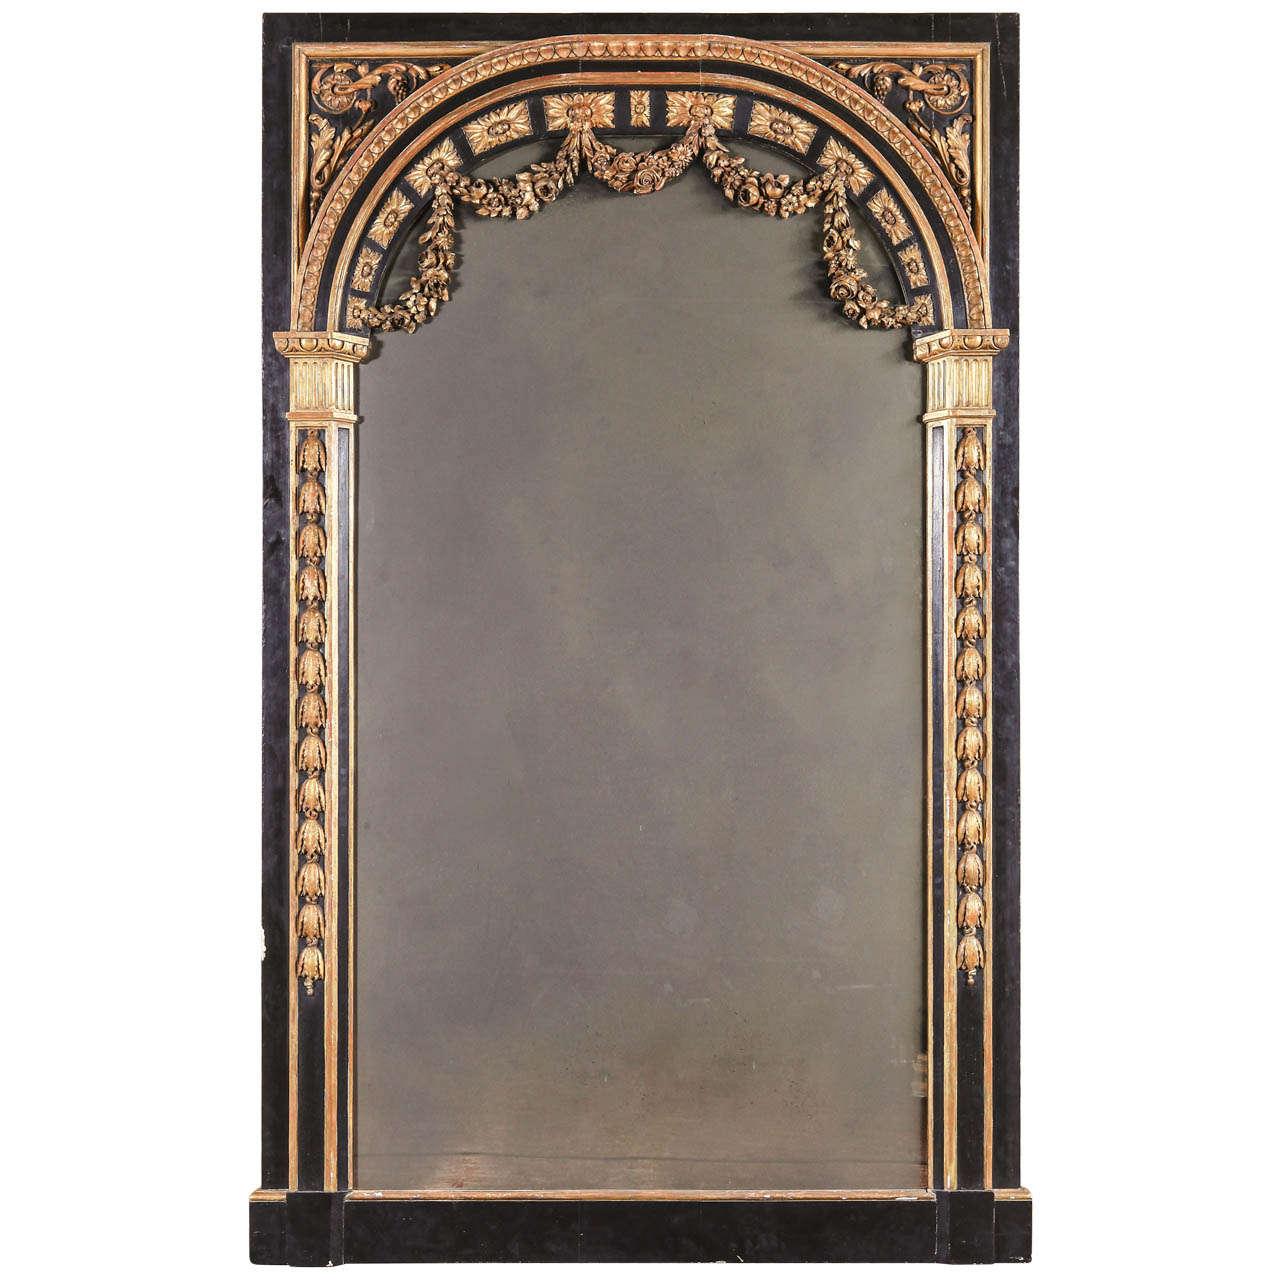 Large French Louis XVI Style Parcel Gilt Mirror